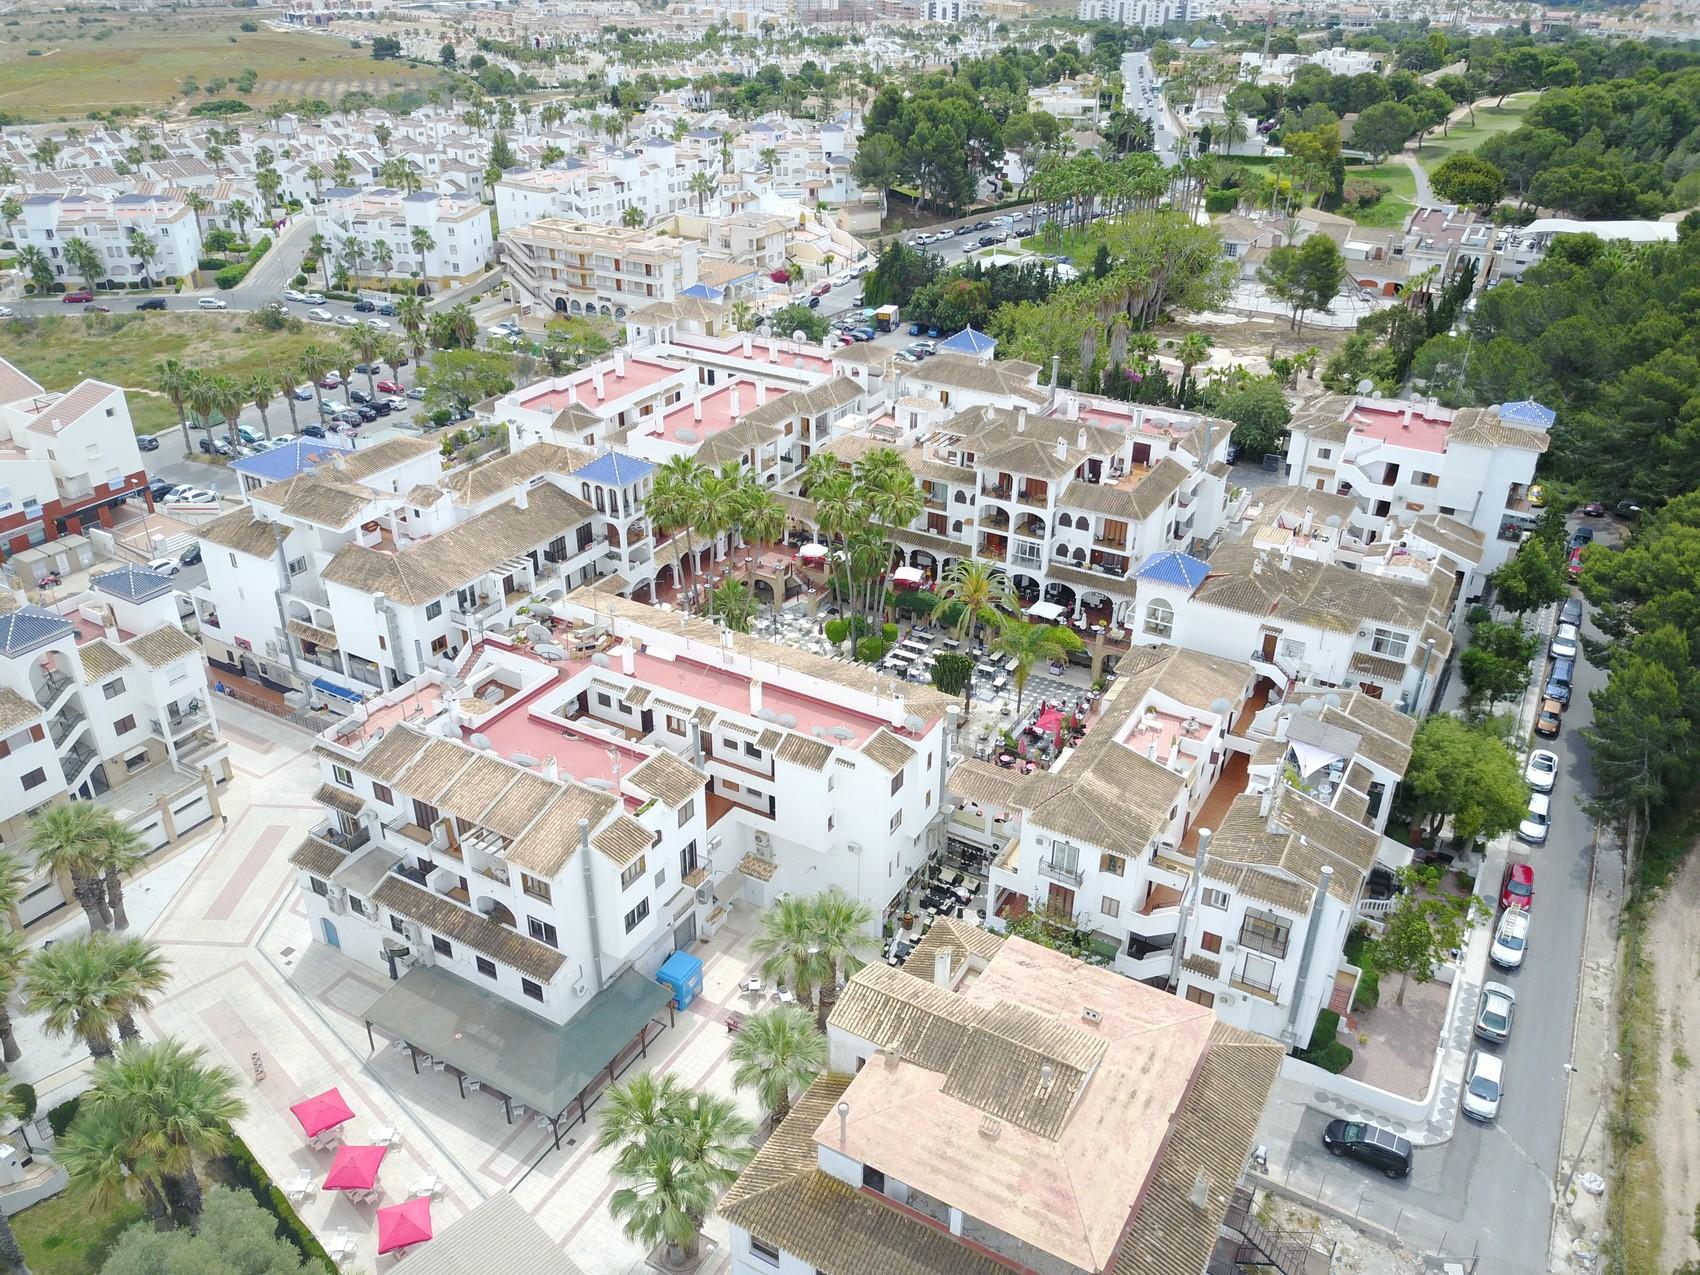 ITSH Property Villamartin Plaza by drone! 24